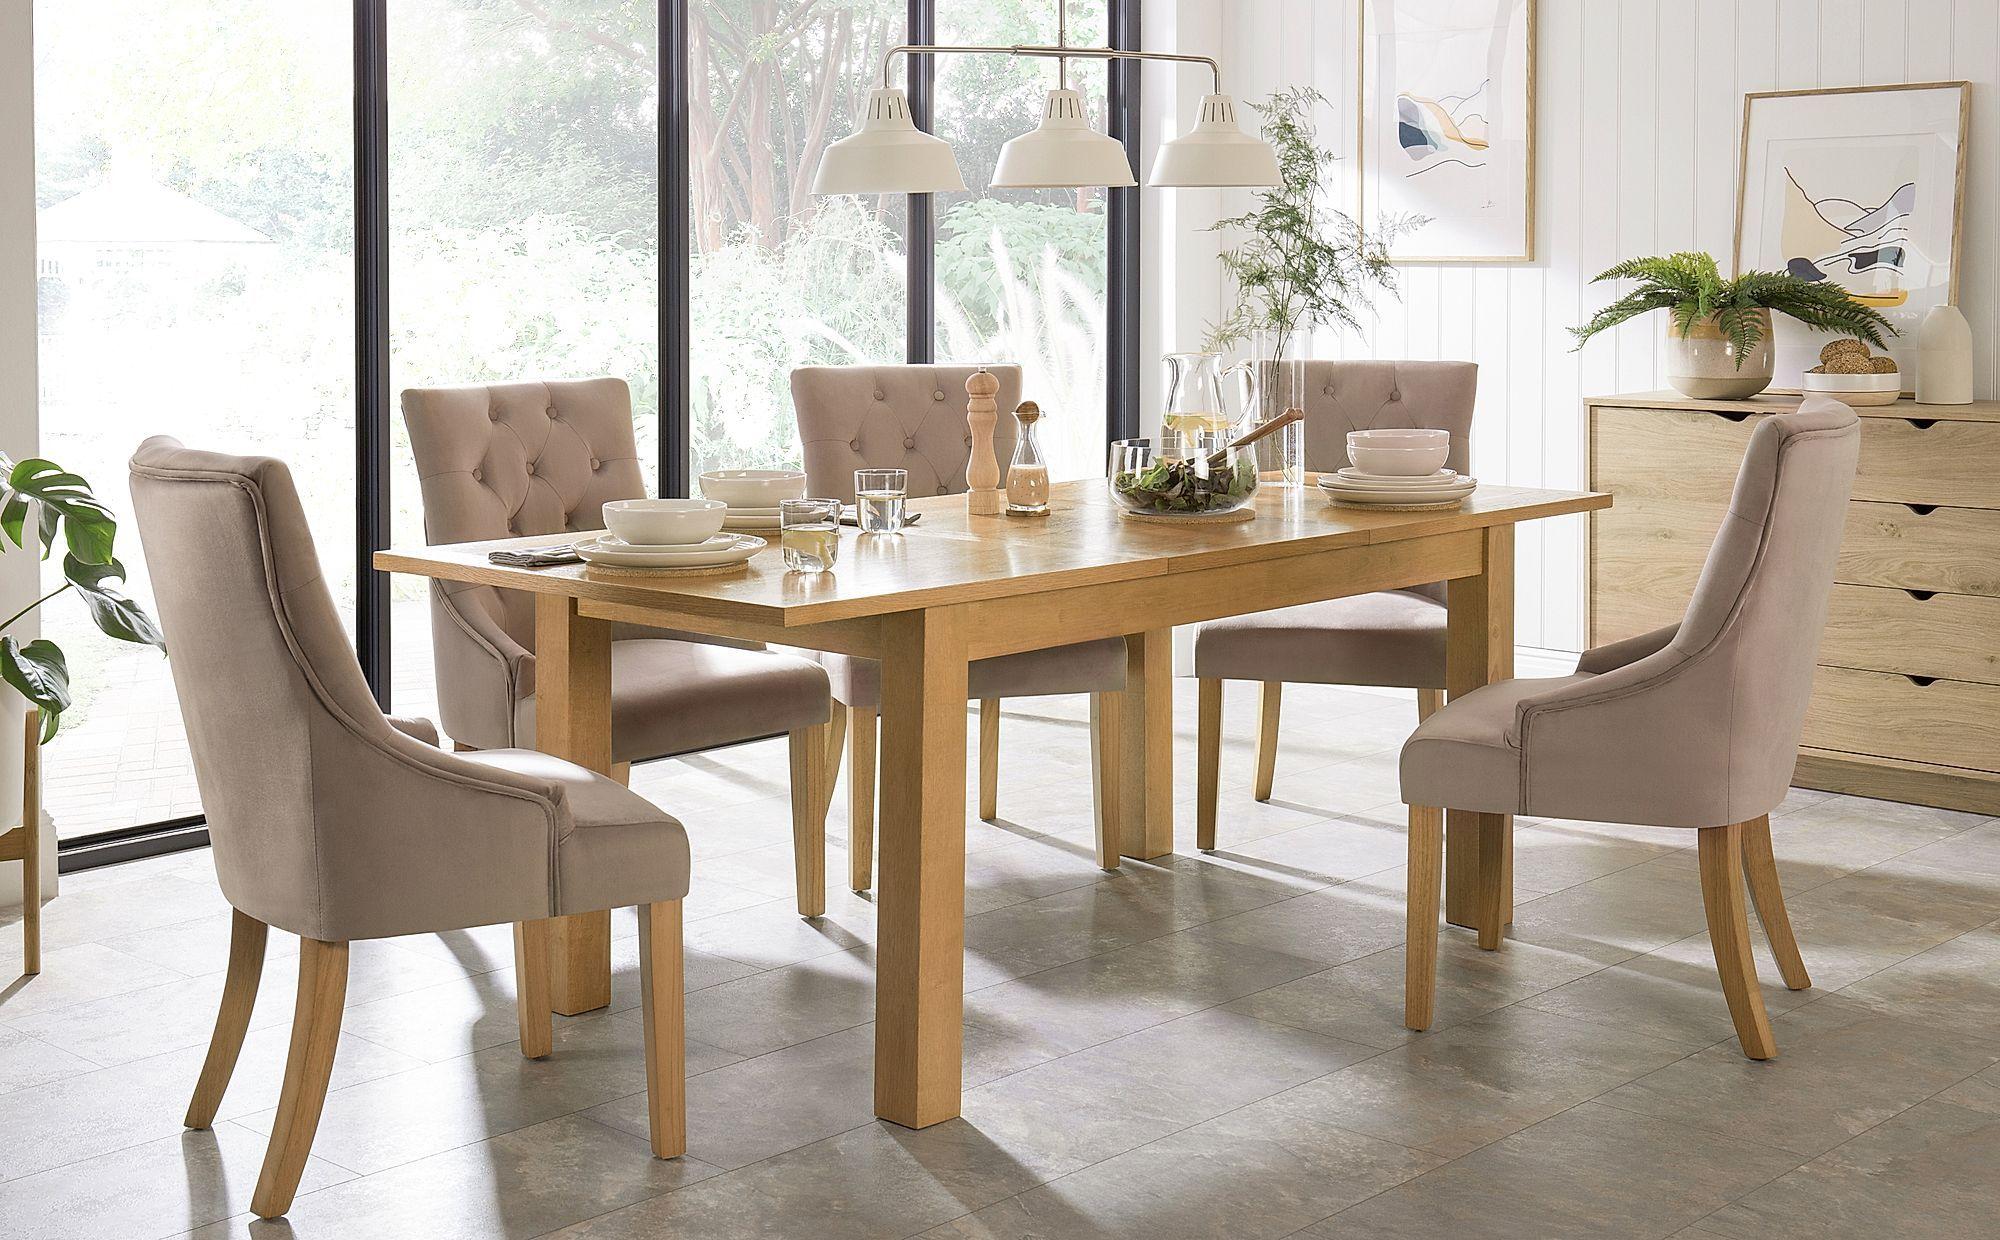 Hamilton Oak 150 200cm Extending Dining Table With 4 Duke Mink